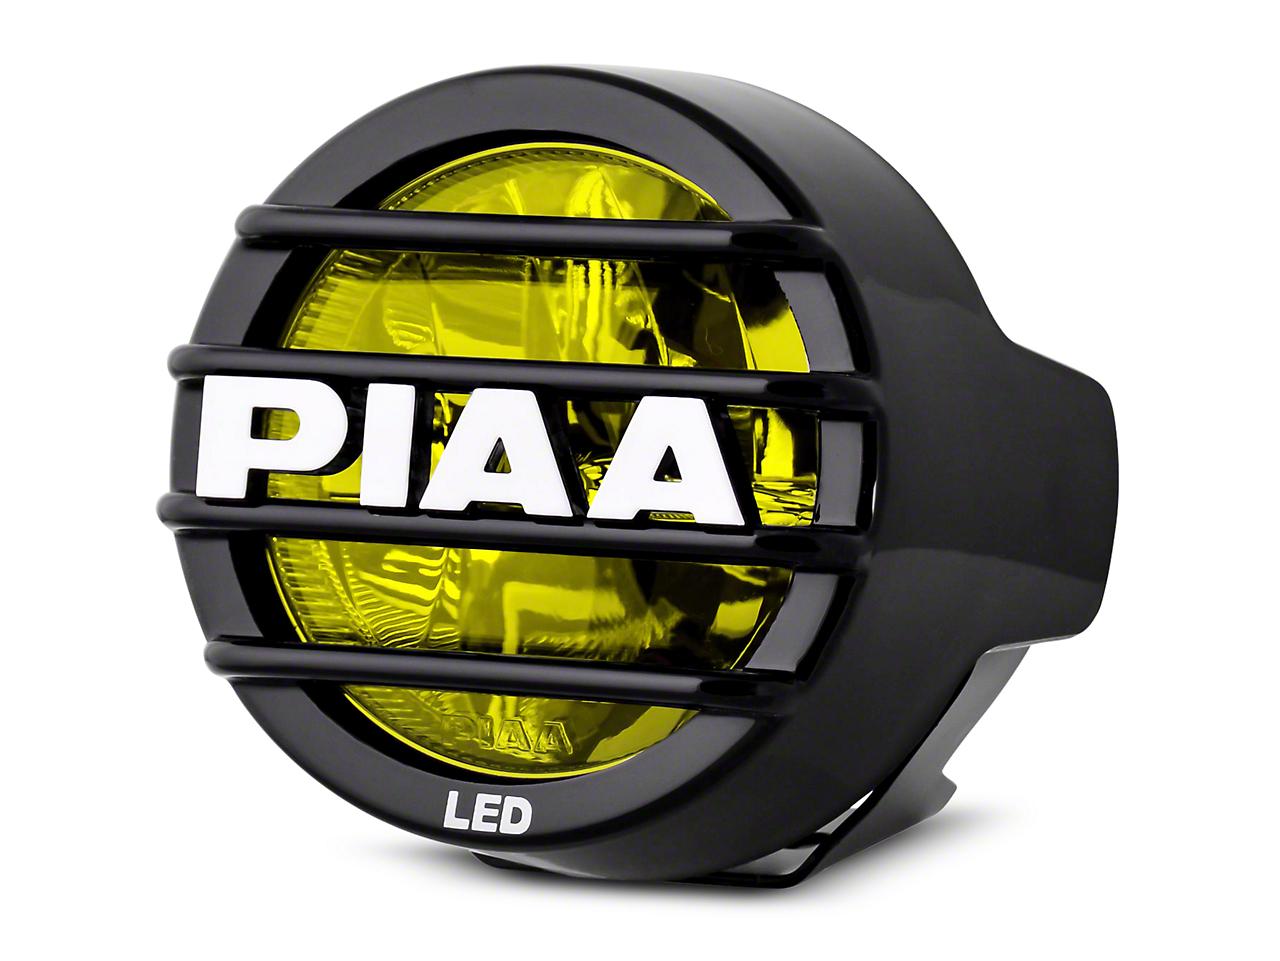 PIAA LP530 3.5 in. Round Ion Yellow LED Light - Fog Beam